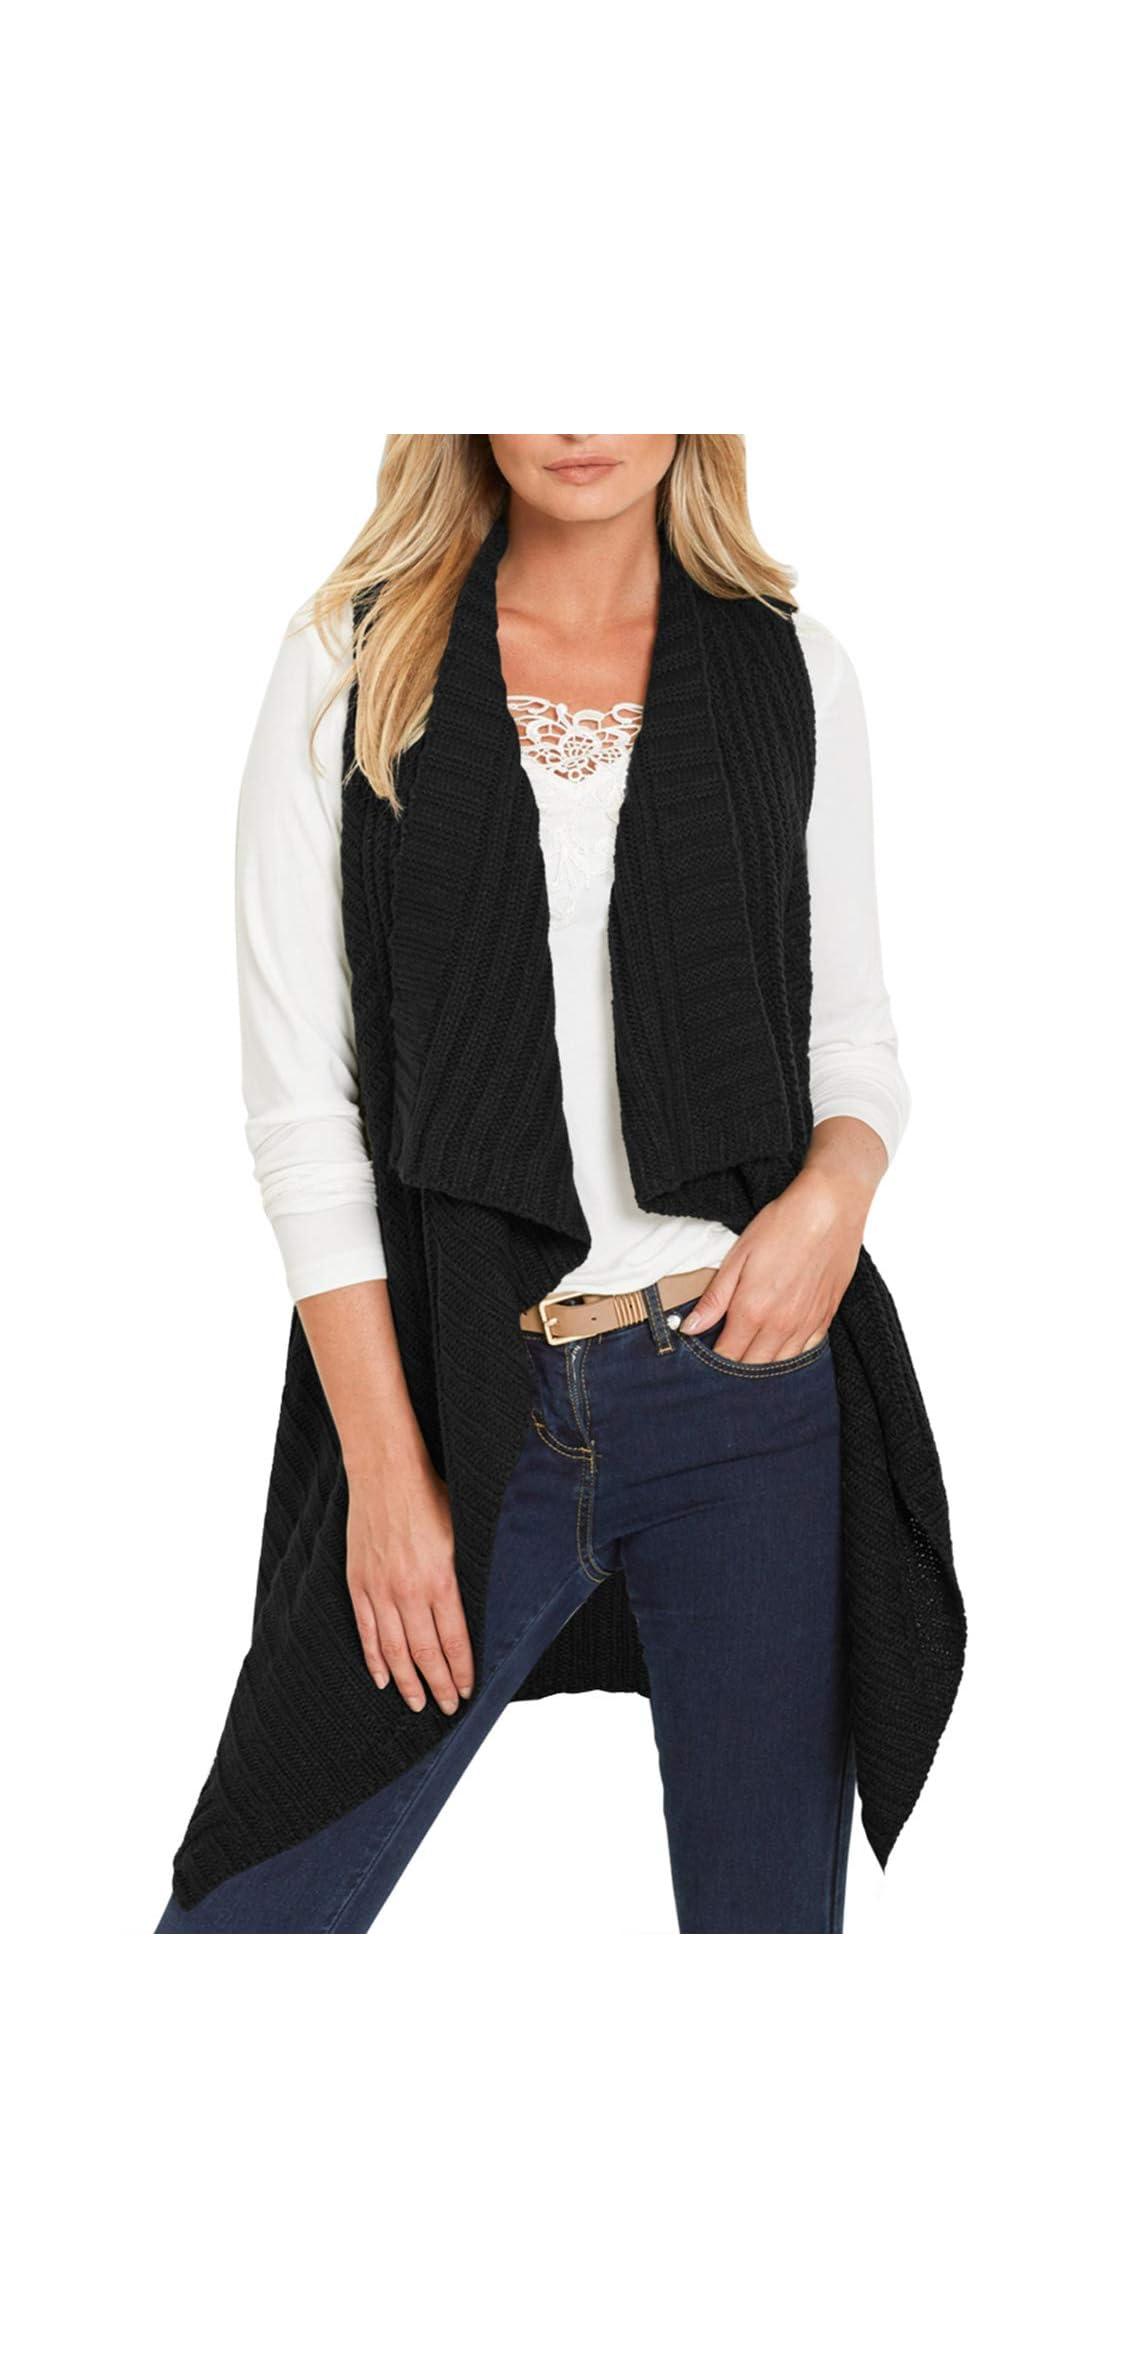 Women's Knit Long Draped Plaid Tunic Sweater Vest